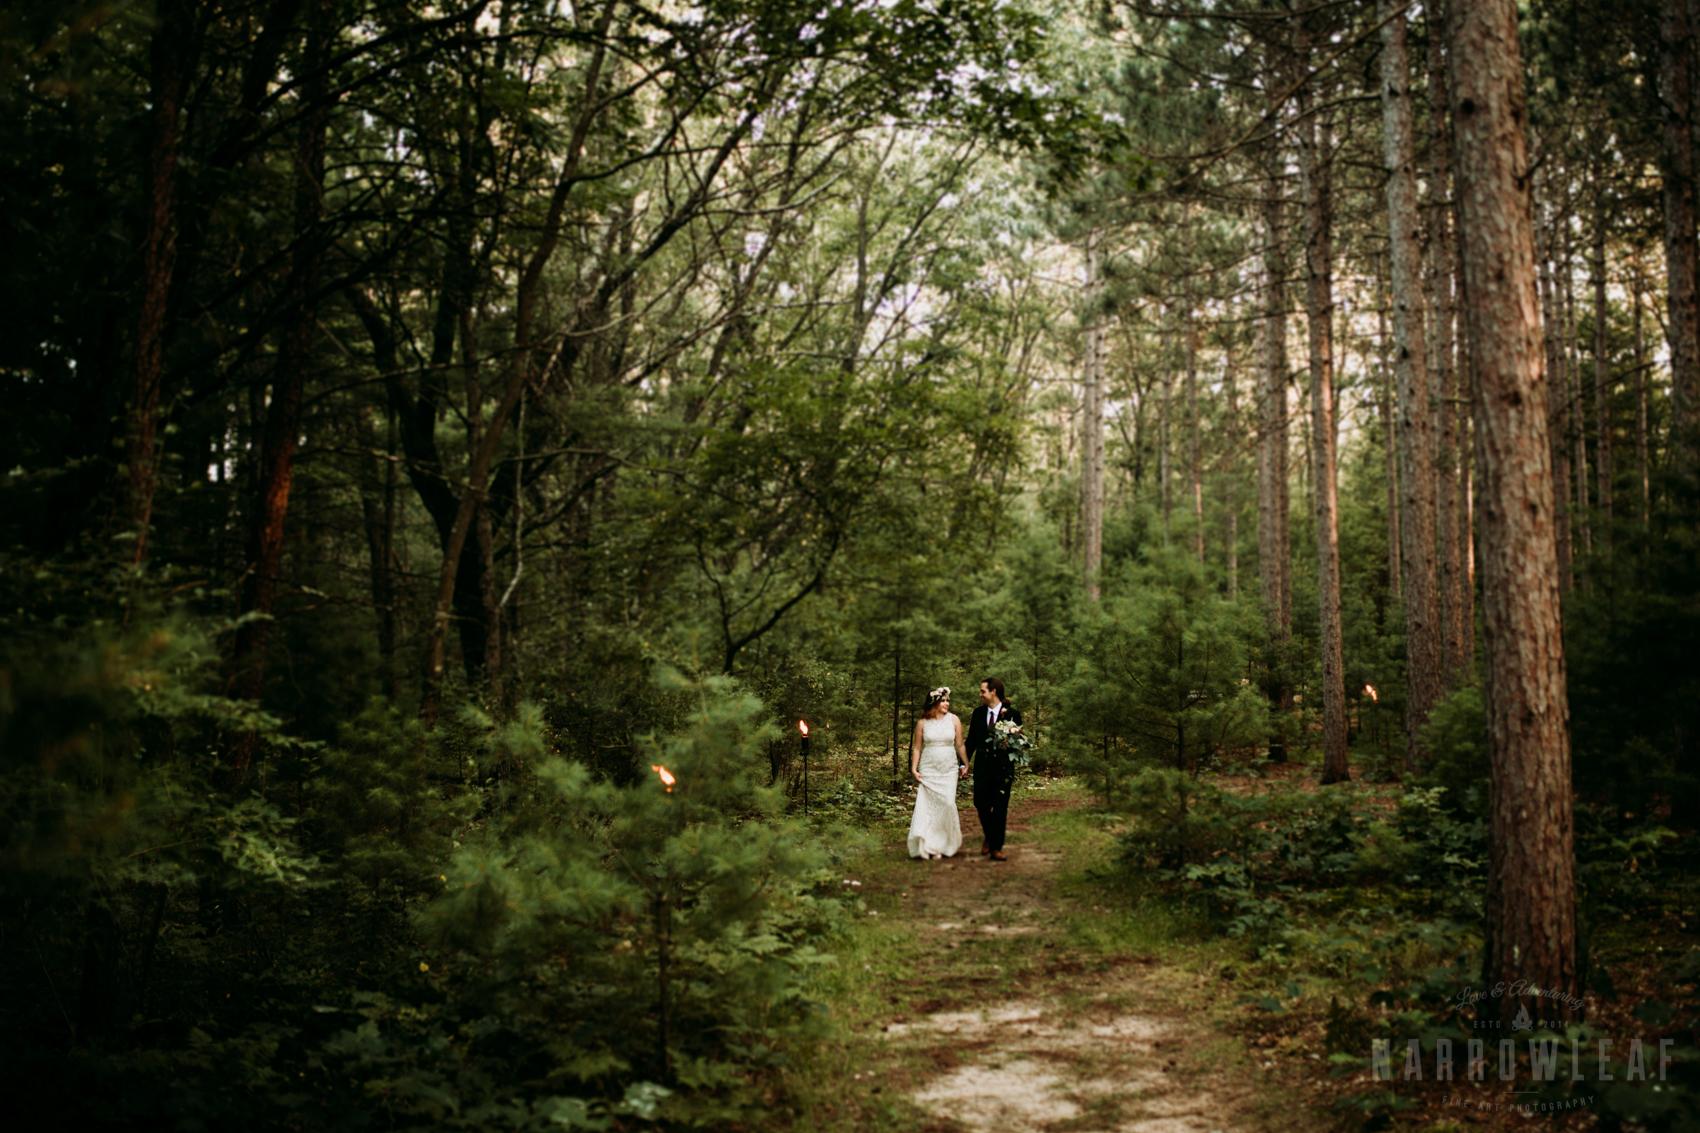 woodsy-bride-groom-romantic-sunset-burlap-and-bells-wi-Narrowleaf-Adventure-Photography-10.jpg